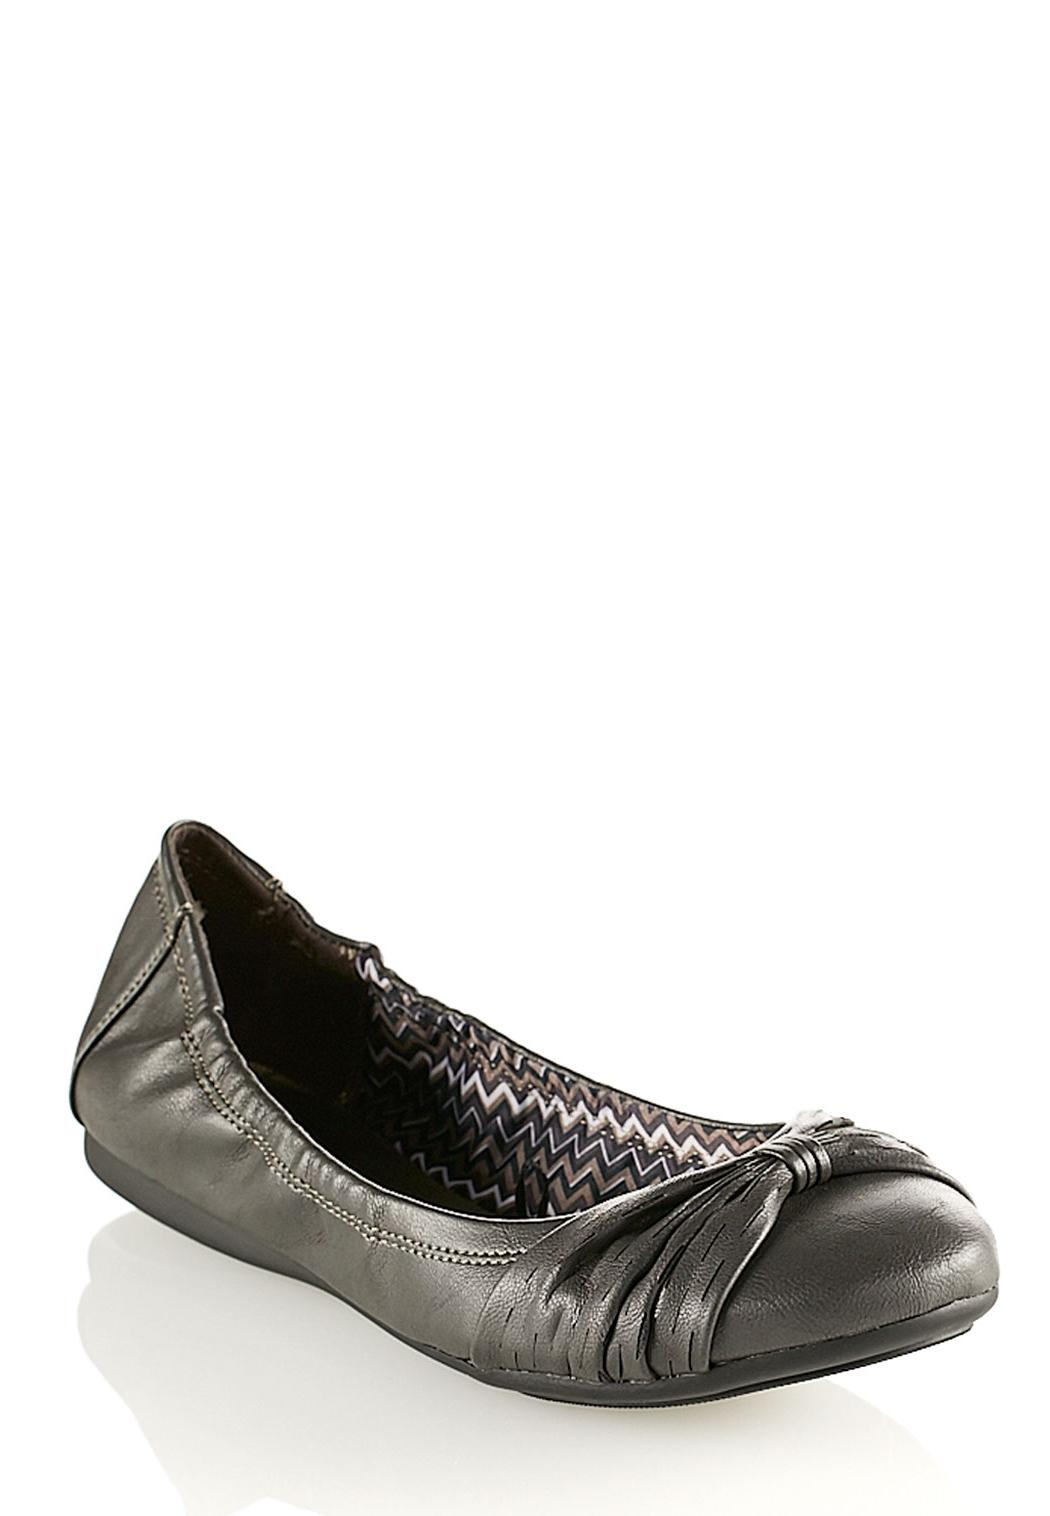 Home D Shoes D Flats D Bow Scrunch Ballet Flats (Style #26920157